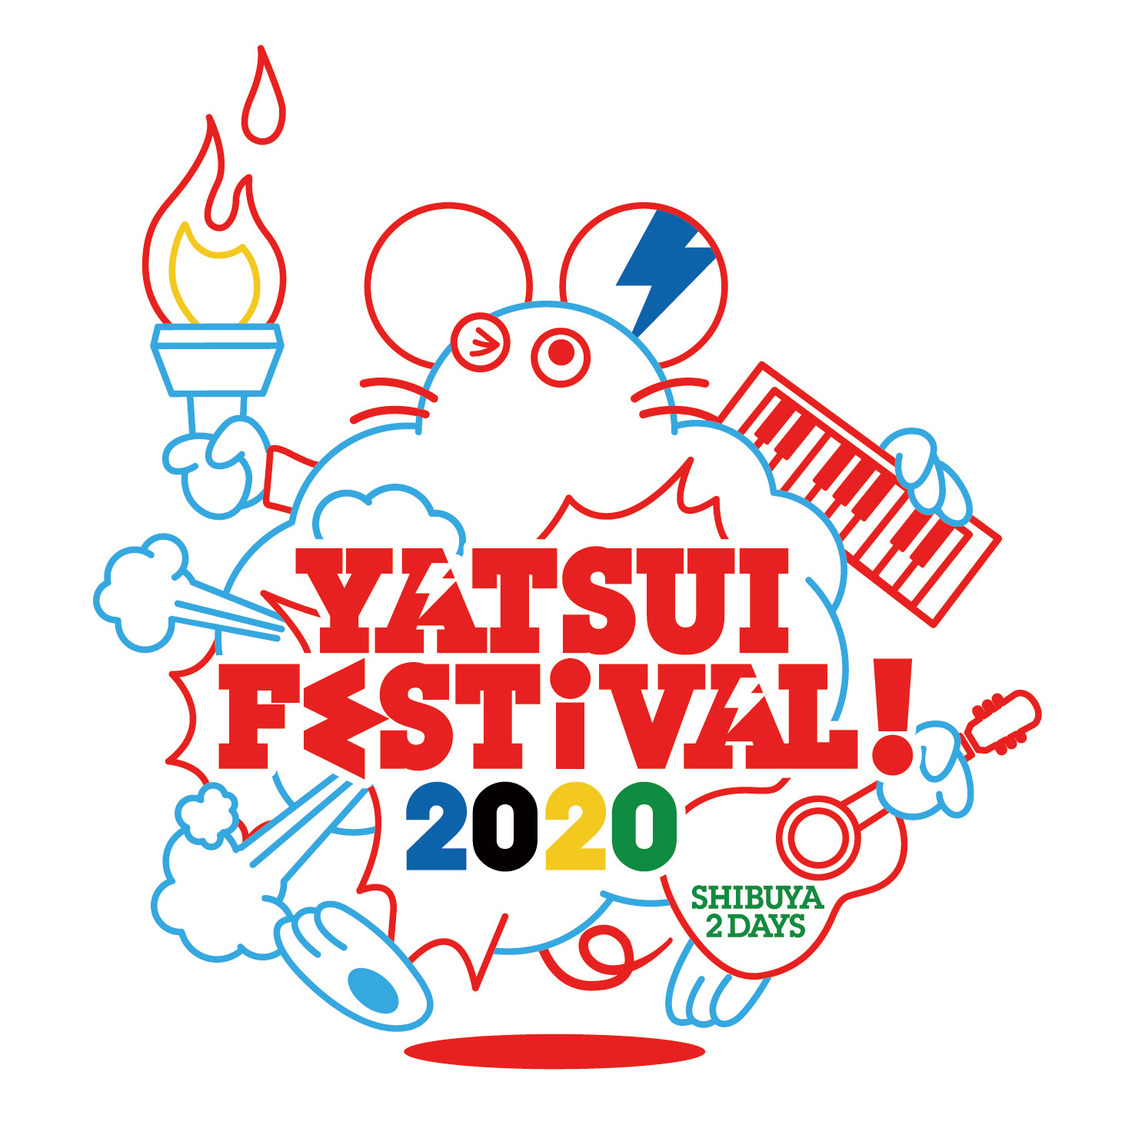 ukka、クマリ、オサカナ、ブクガら<YATSUI FESTIVAL!2020>出演決定!